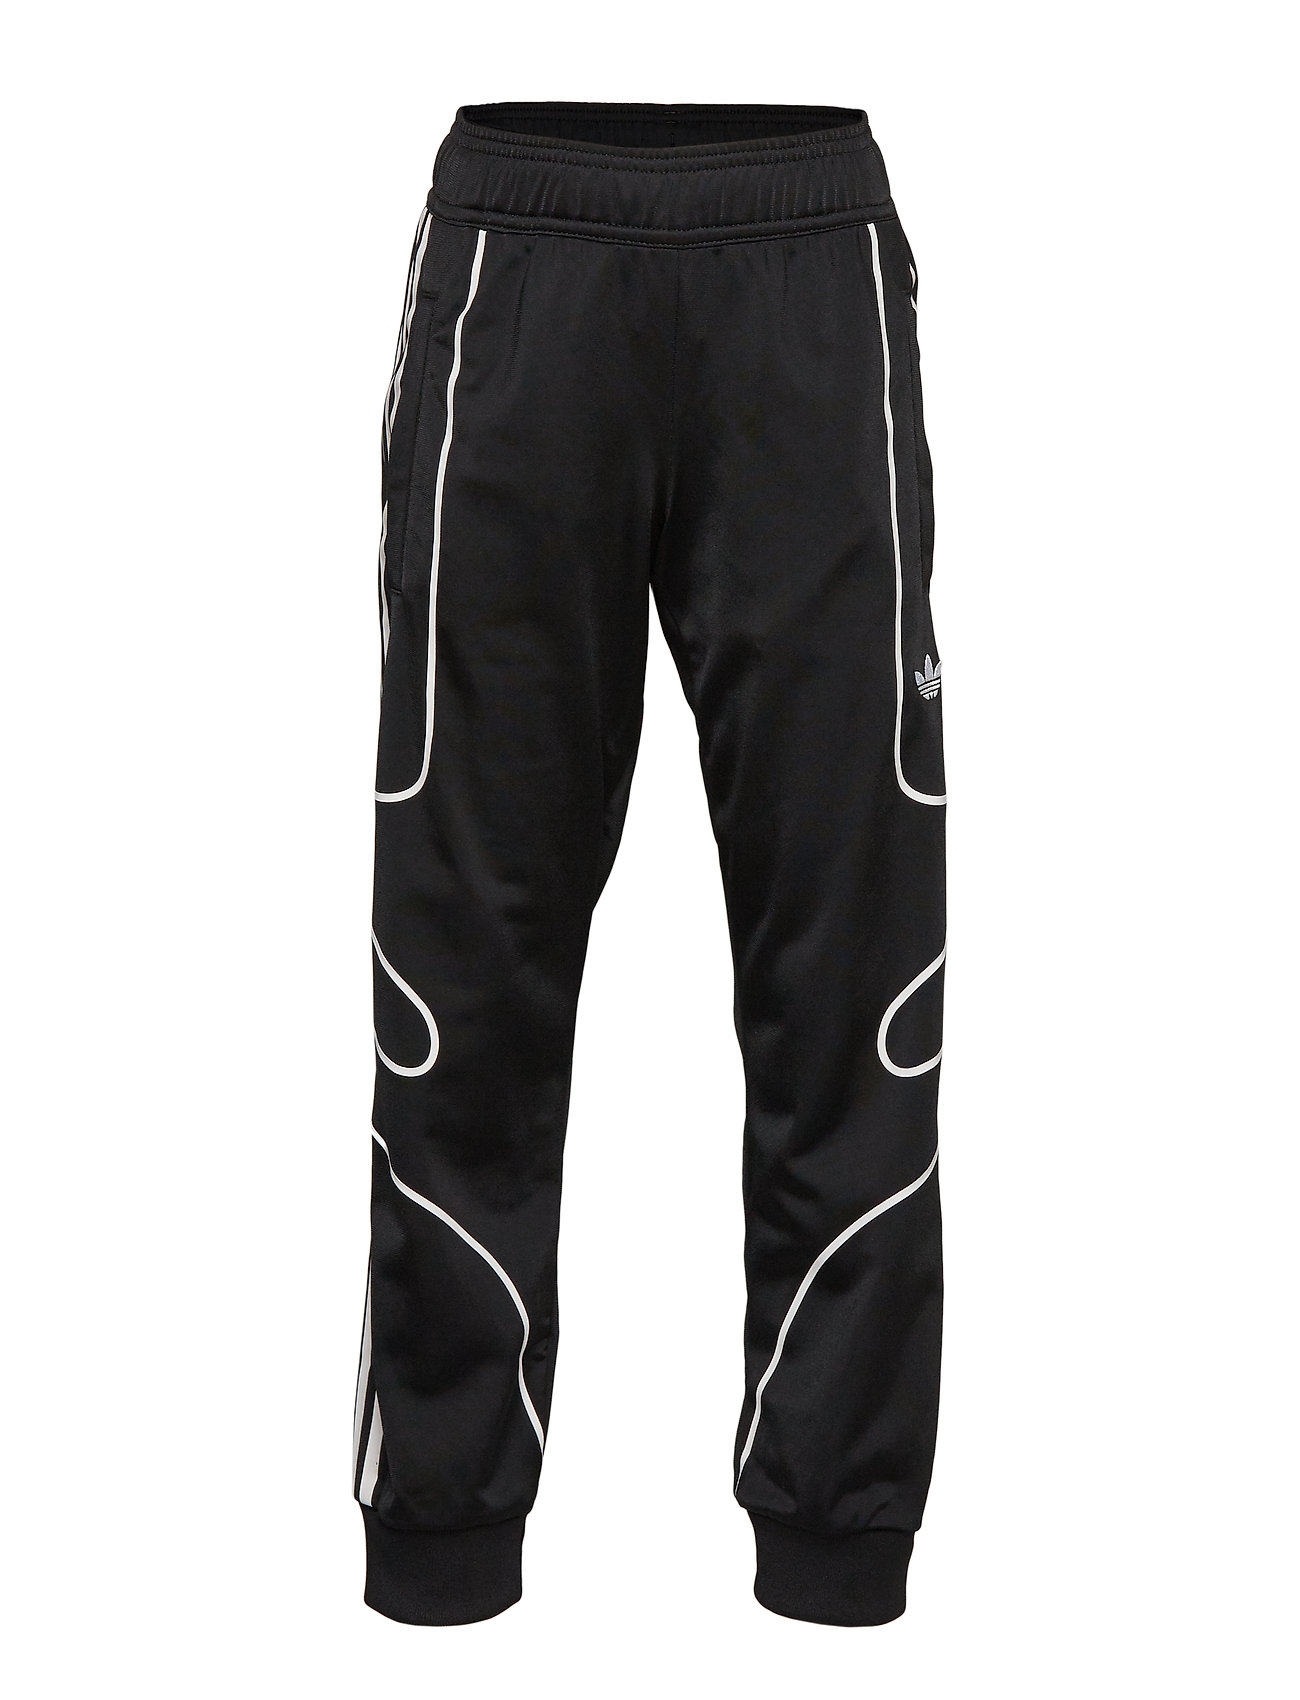 adidas Originals FLAMESTRK PANTS - BLACK/WHITE